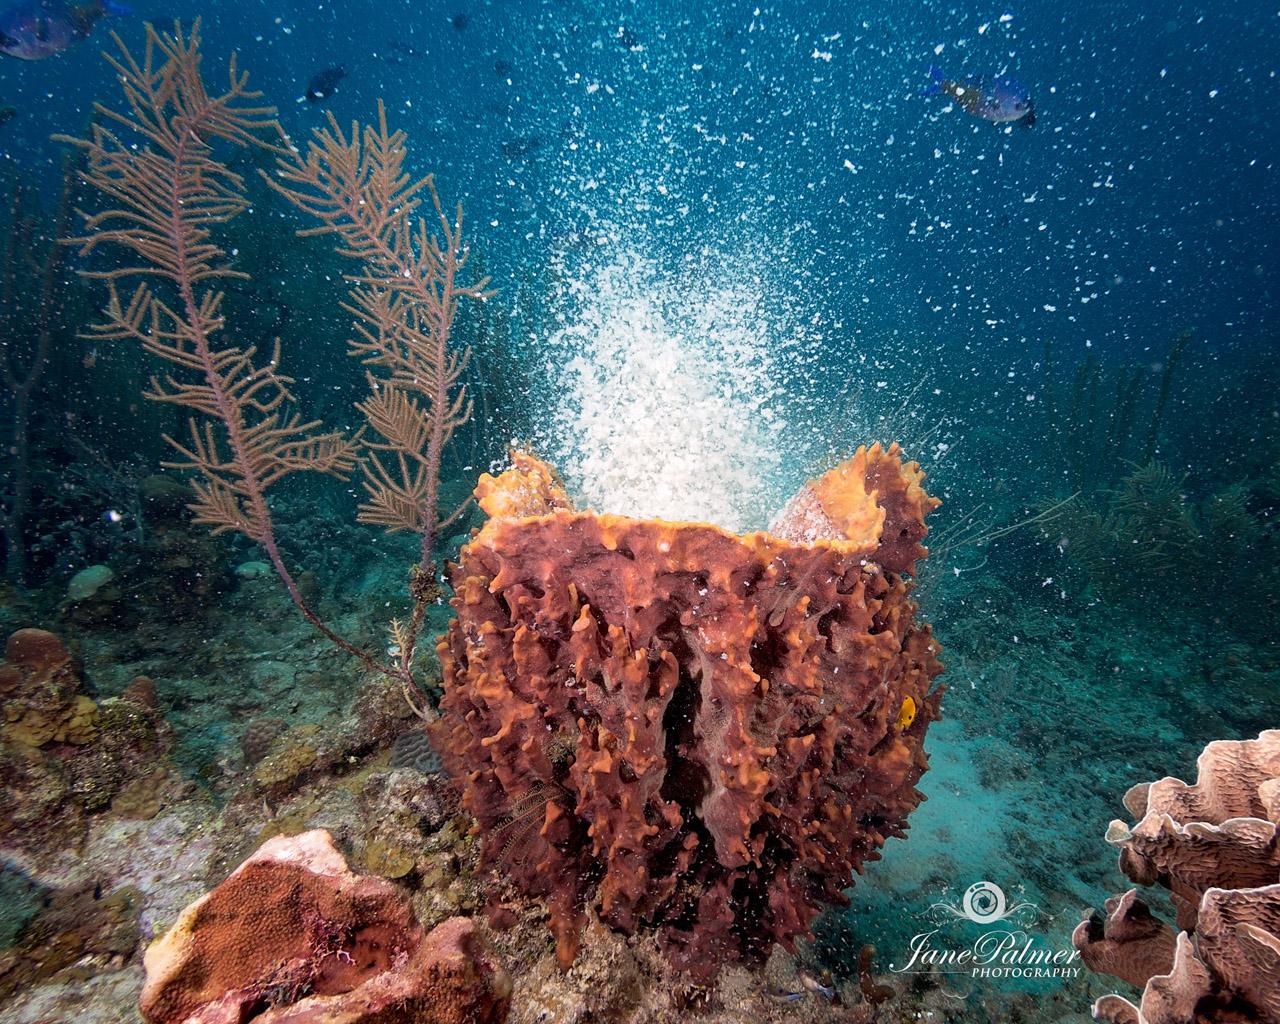 Underwater Photography by Jane Palmer